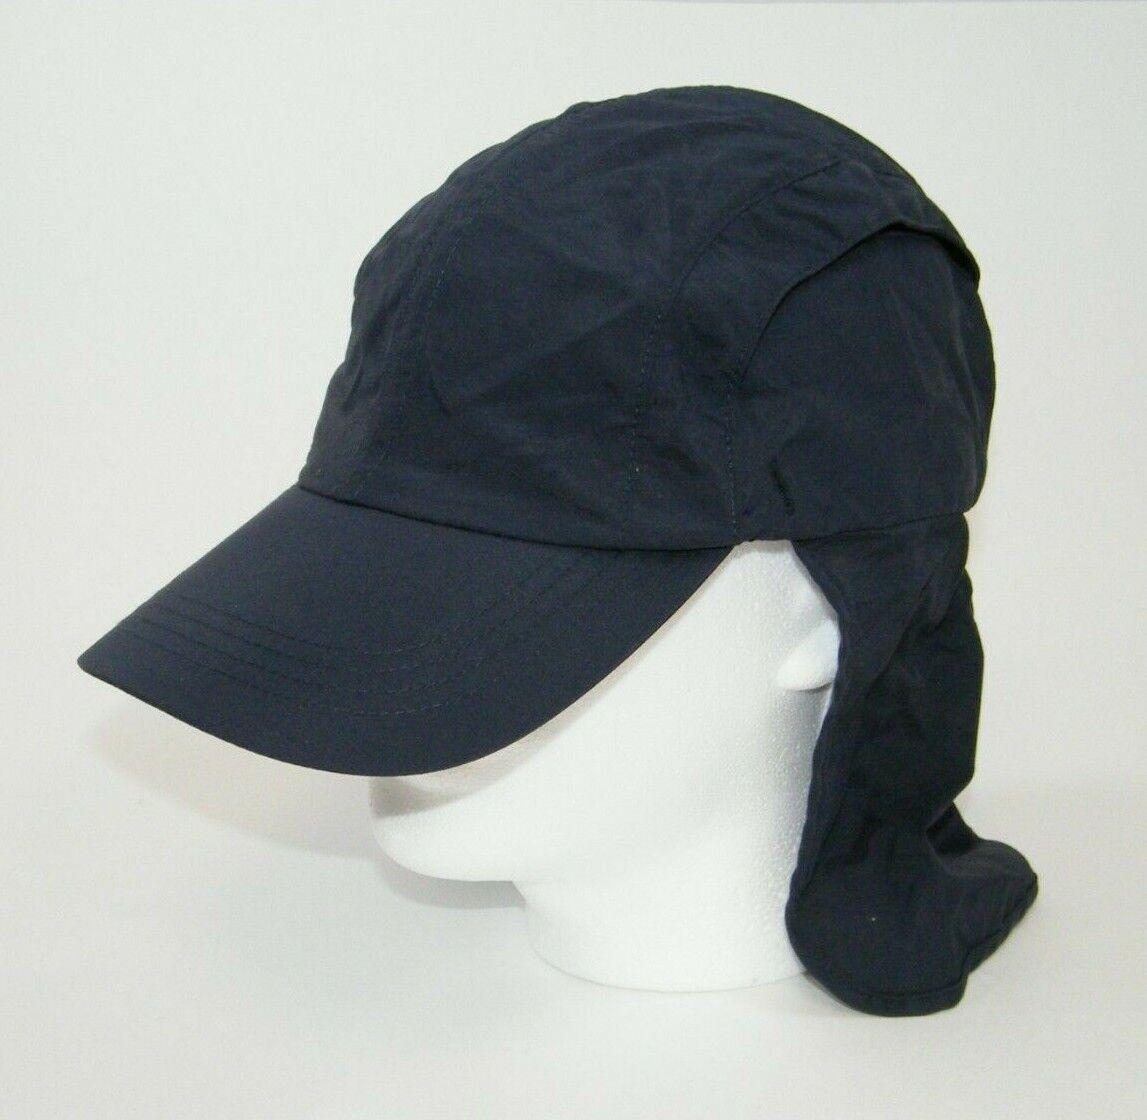 (5) FAHRENHEIT OUTDOOR COLLECTION NYLON CAPS / HATS 682 W / NECK FLAPS NAVY BLUE